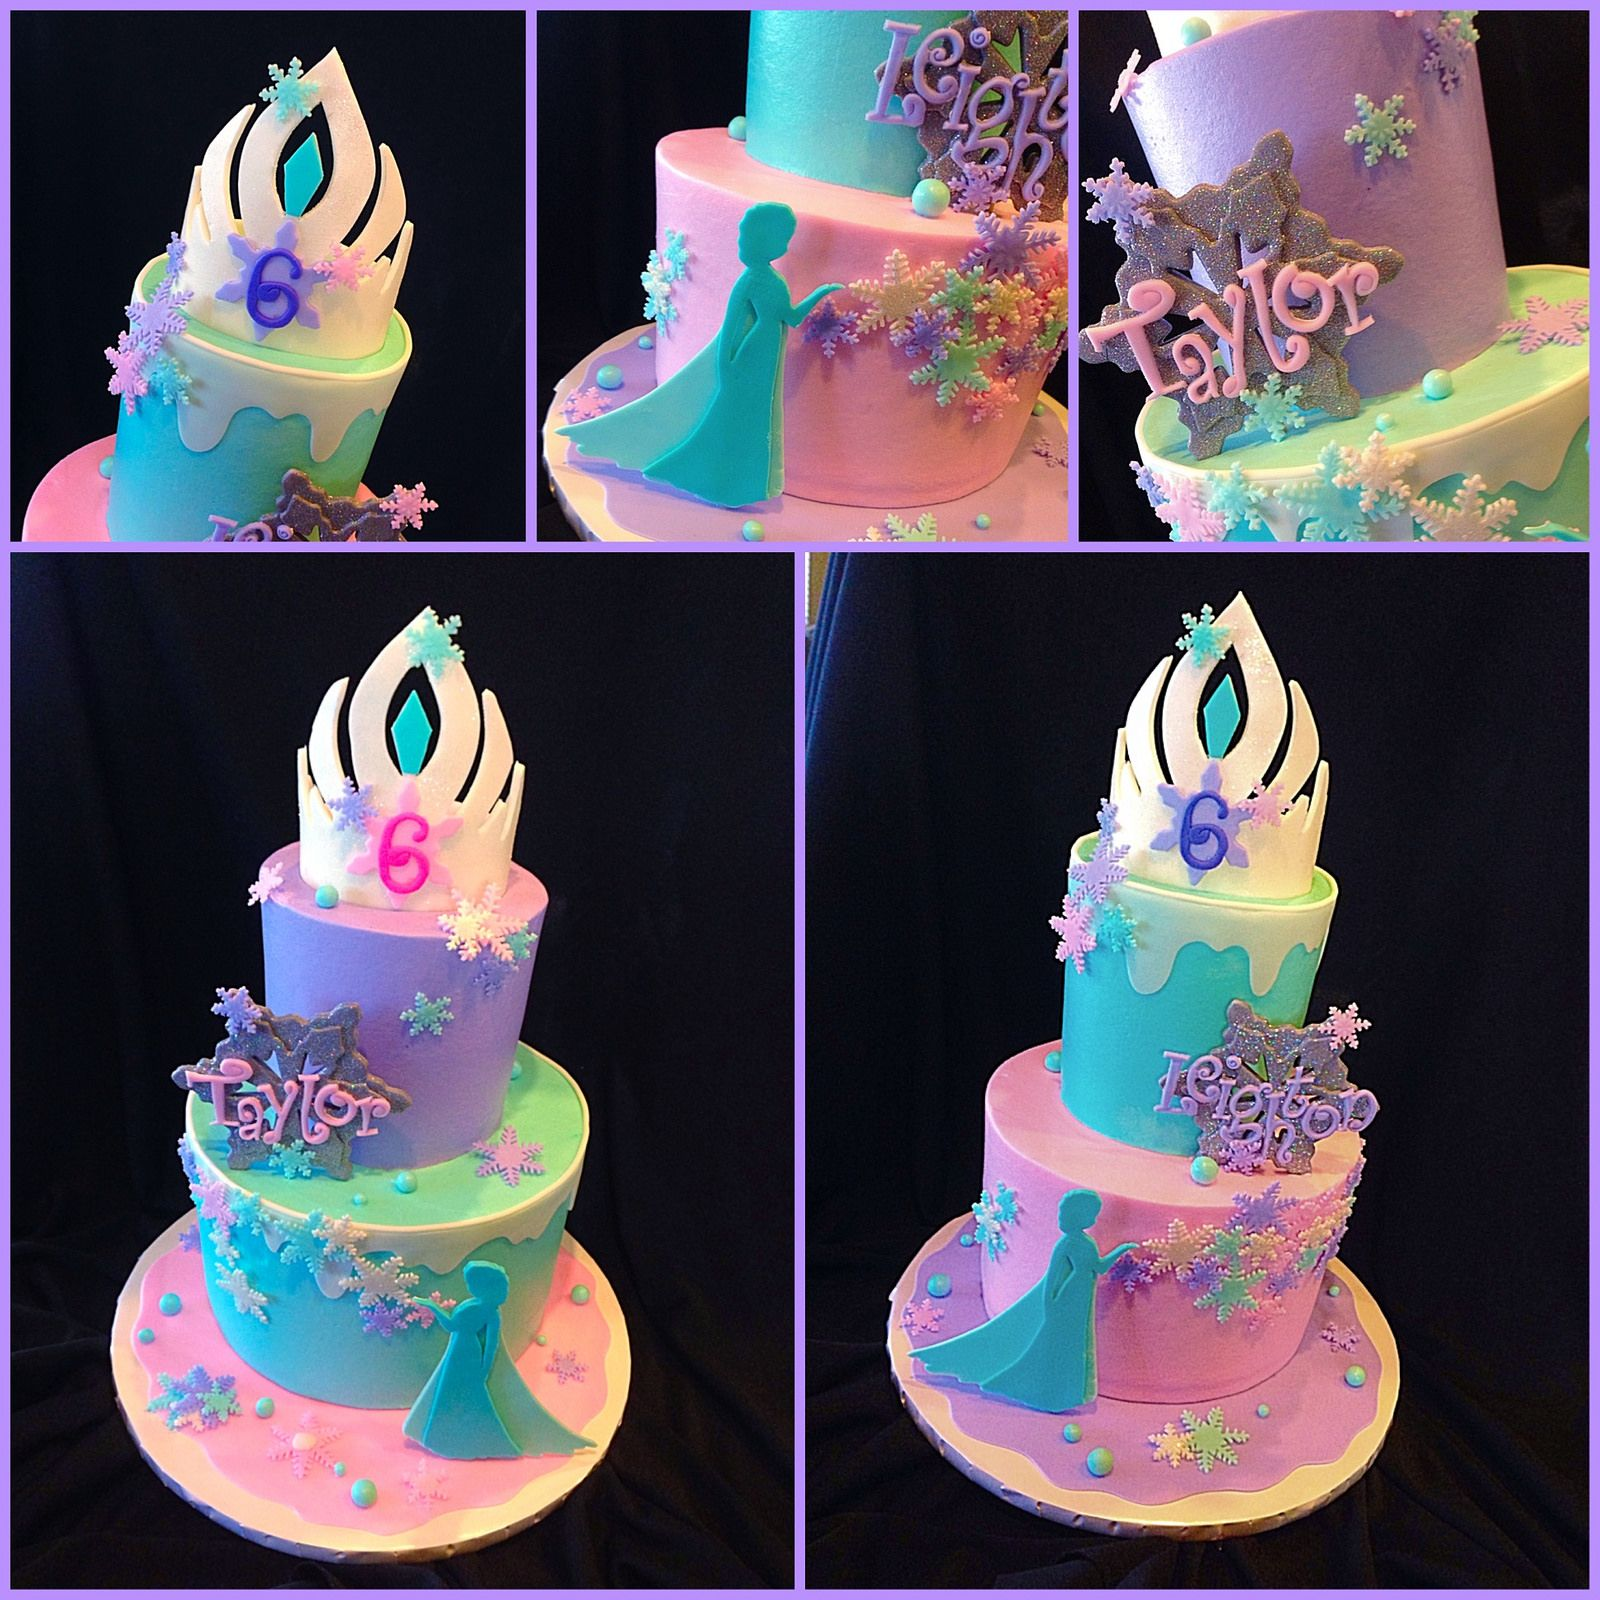 Admirable Beautiful Frozen Birthday Cake Frozen Cake 6Th Birthday Cakes Funny Birthday Cards Online Barepcheapnameinfo